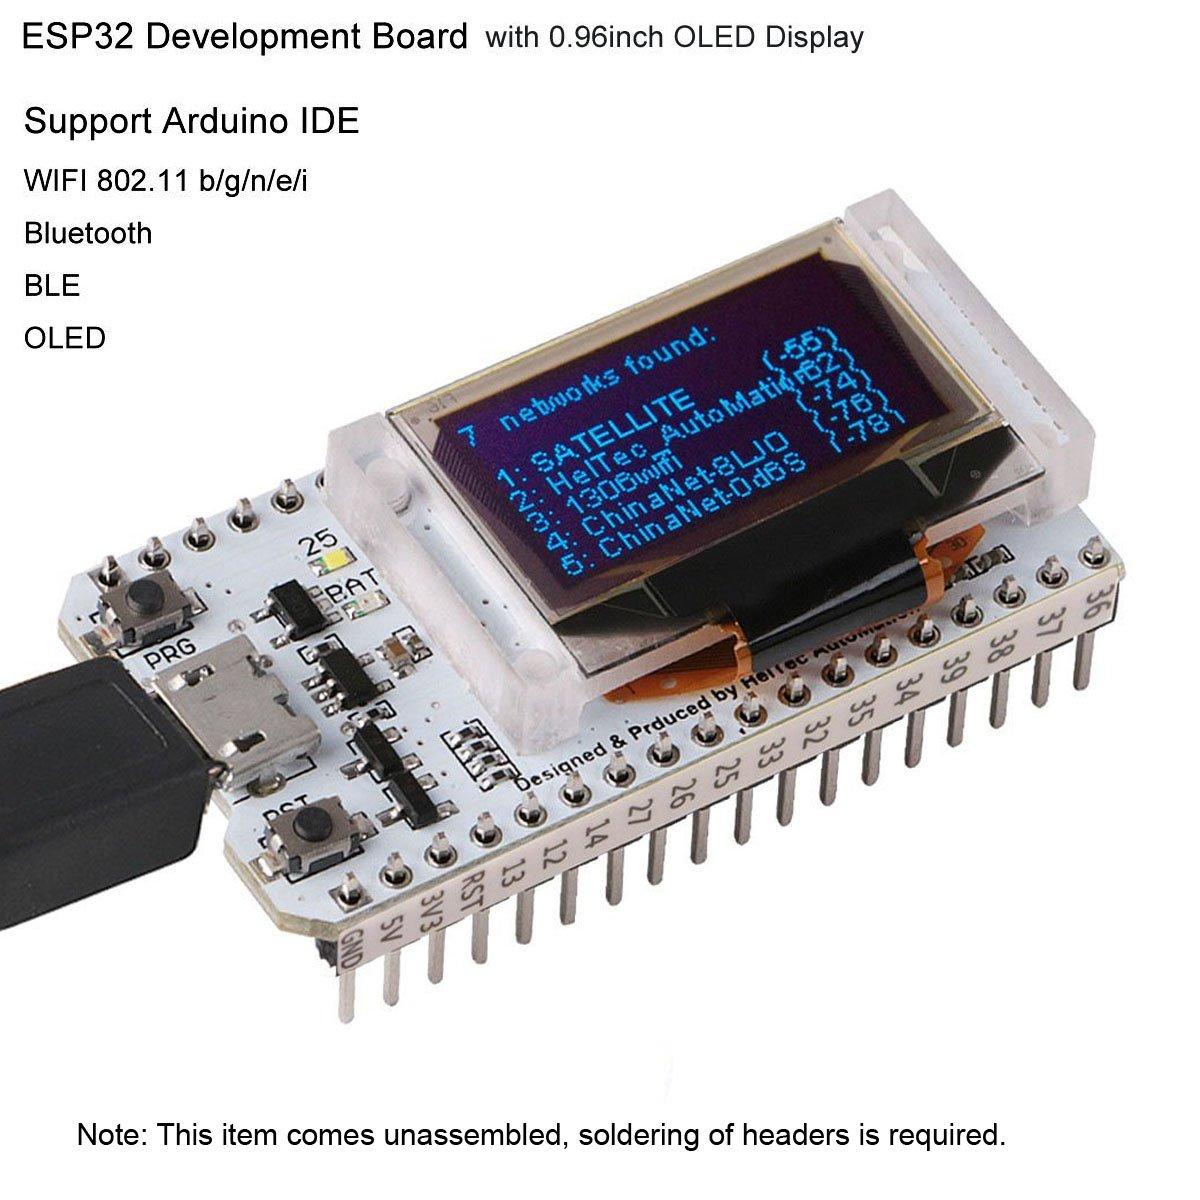 MakerFocus ESP32 OLED WiFi Kit ESP-32 0 96 Inch OLED Display WiFi+Bluetooth  CP2102 Internet Development Board for Arduino ESP8266 NodeMCU